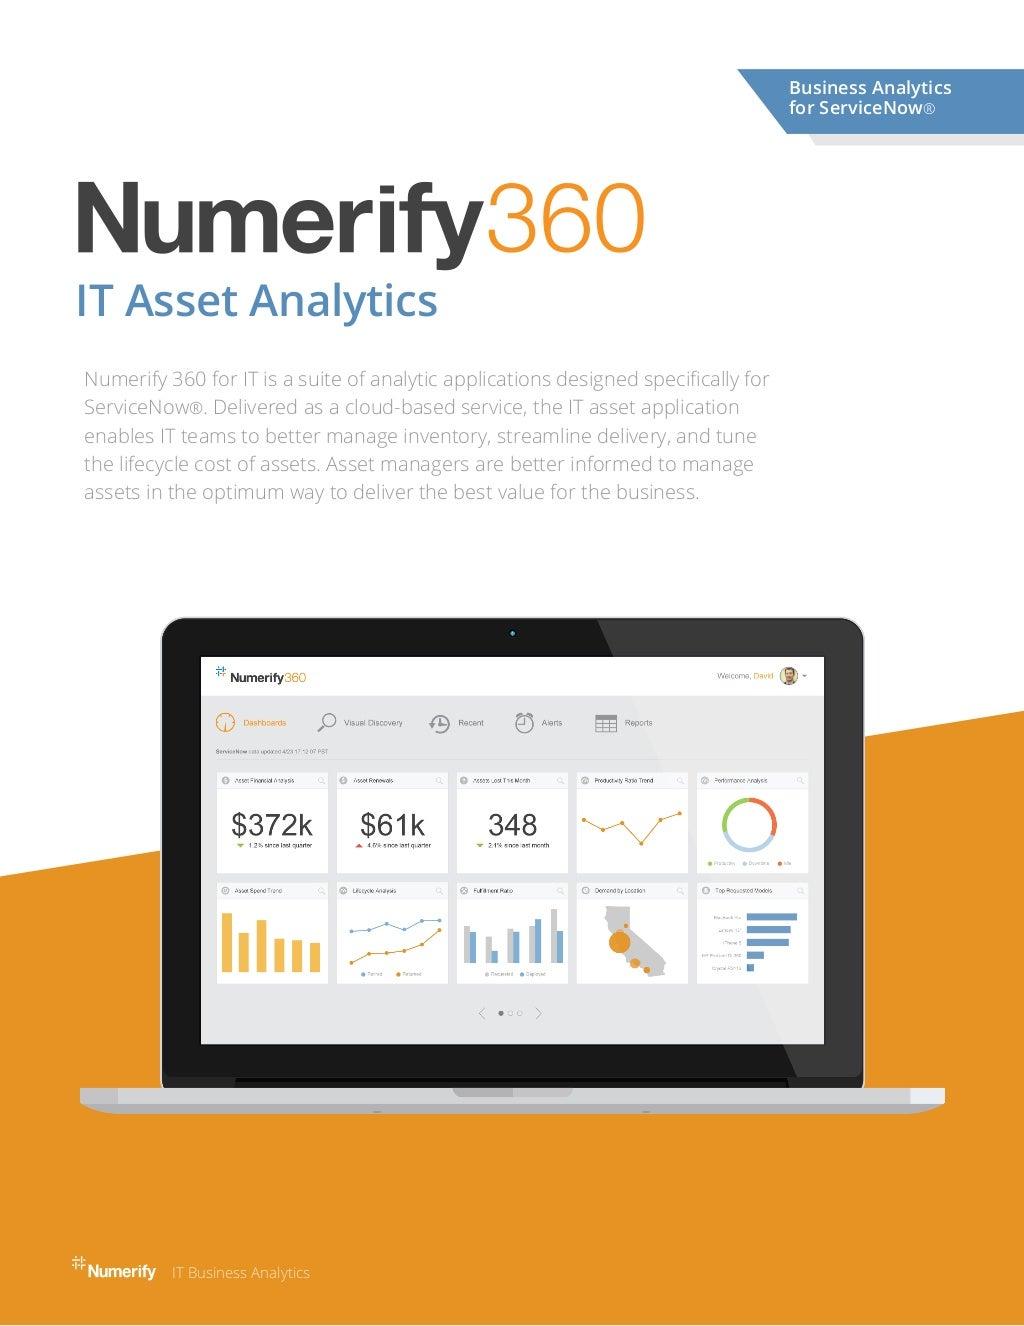 Numerify IT Asset Analytics for ServiceNow